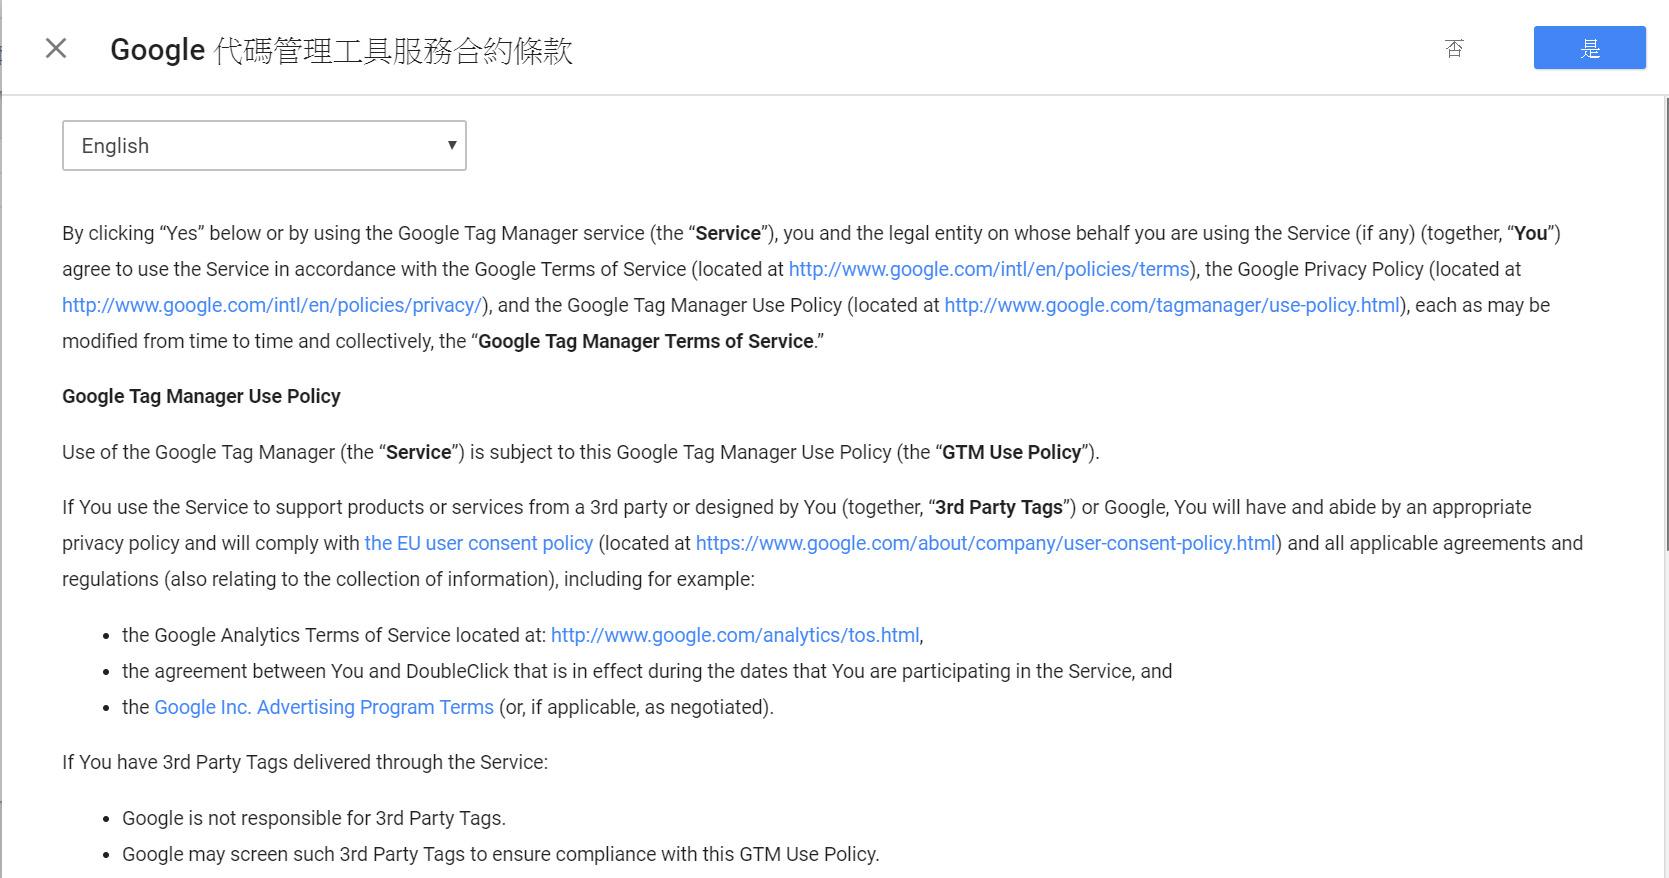 Google 代碼管理工具服務合約條款